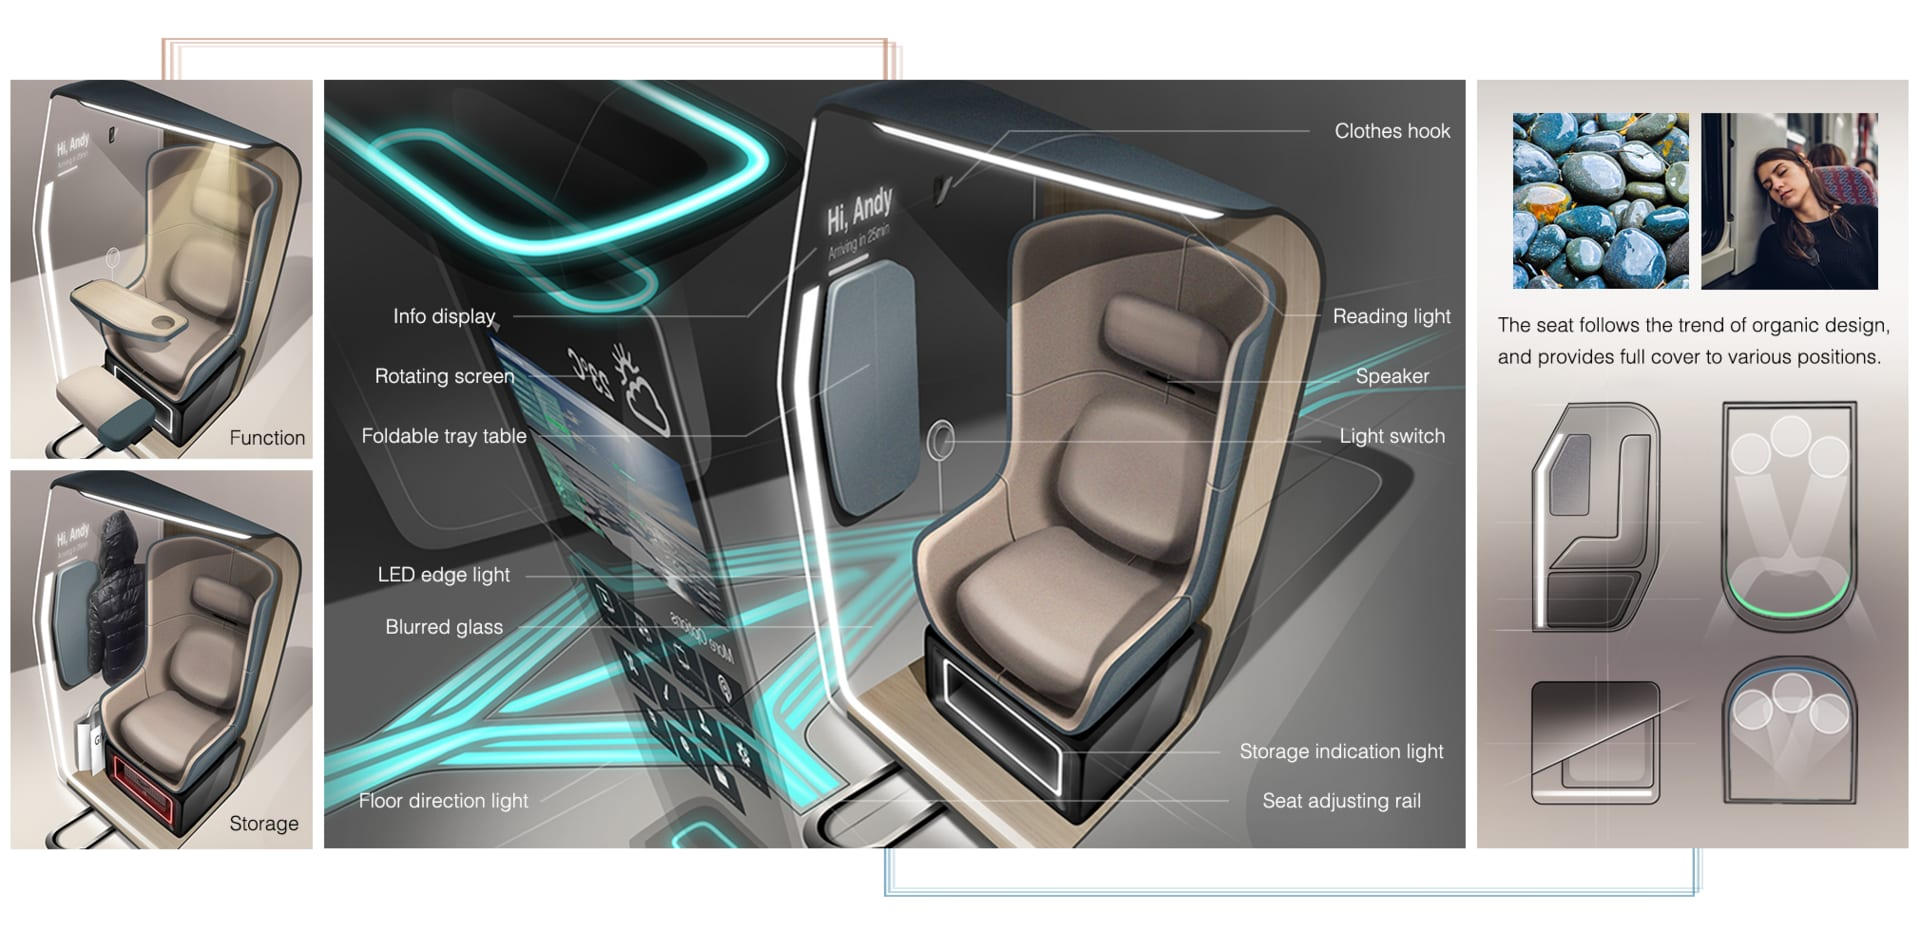 12.Final seat design